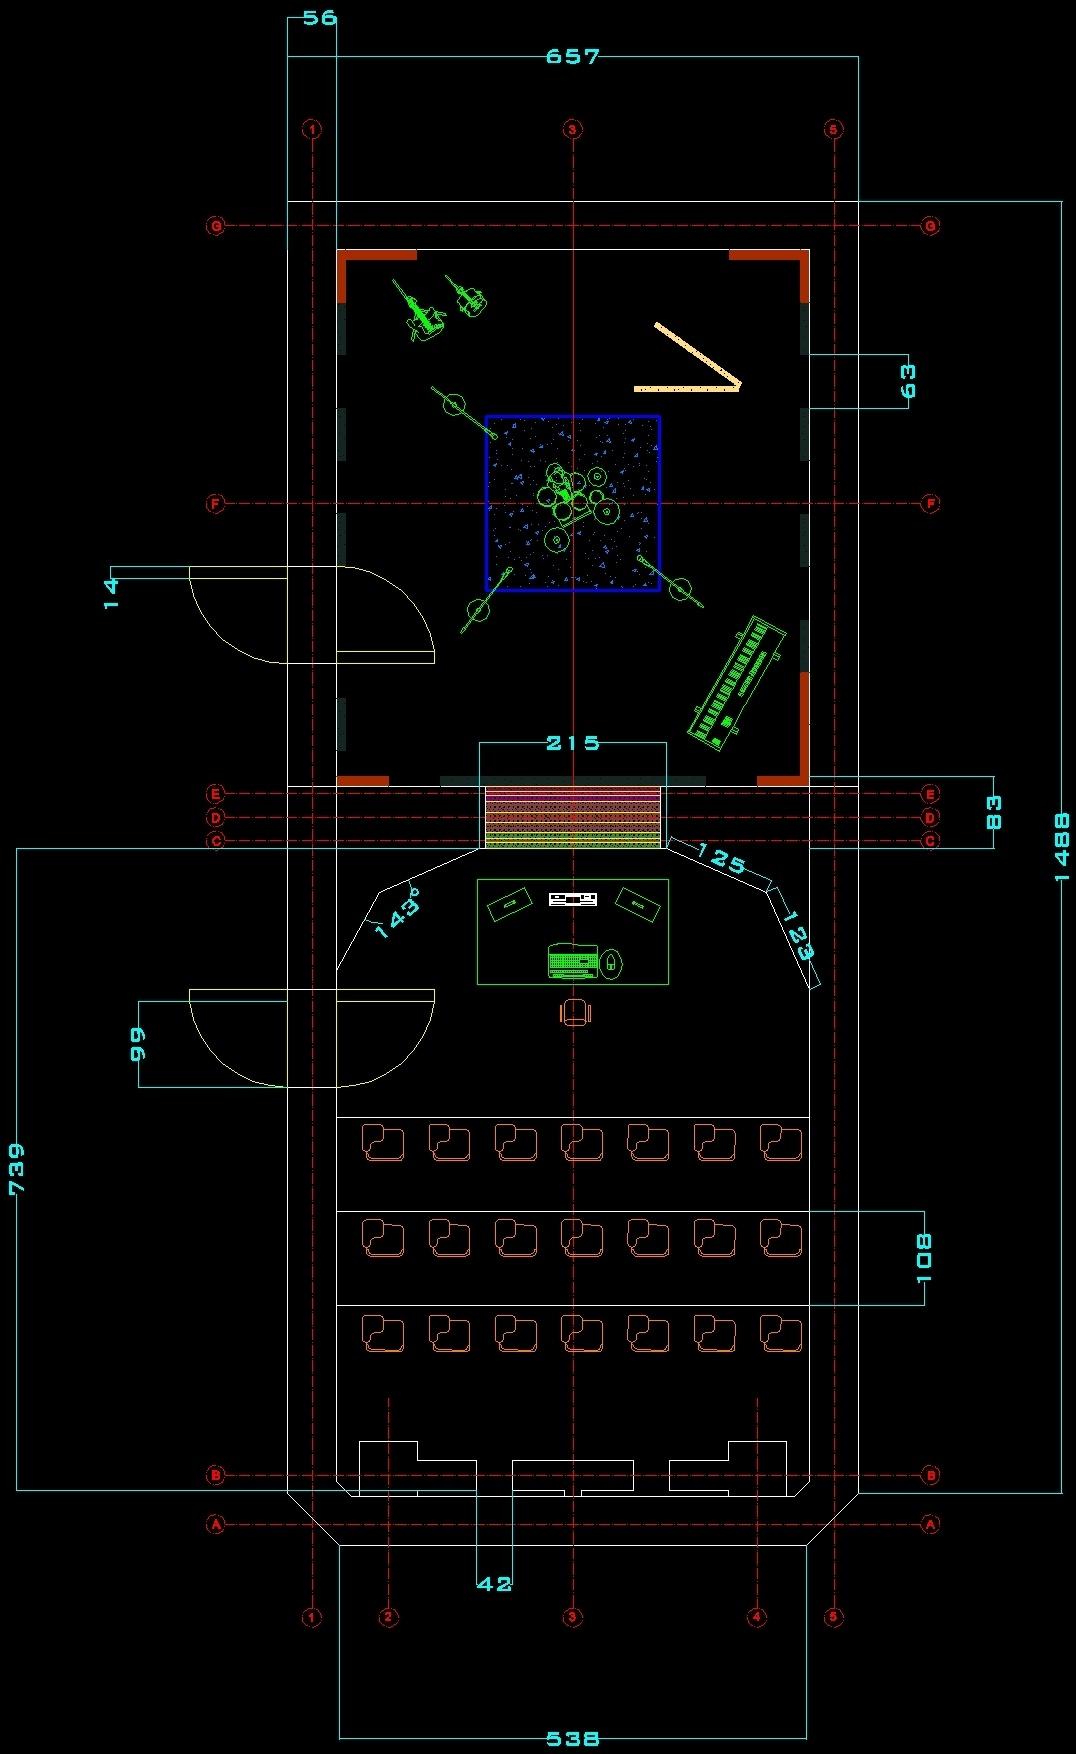 Autocad 3d House Design Software: Recording Studio DWG Block For AutoCAD • Designs CAD